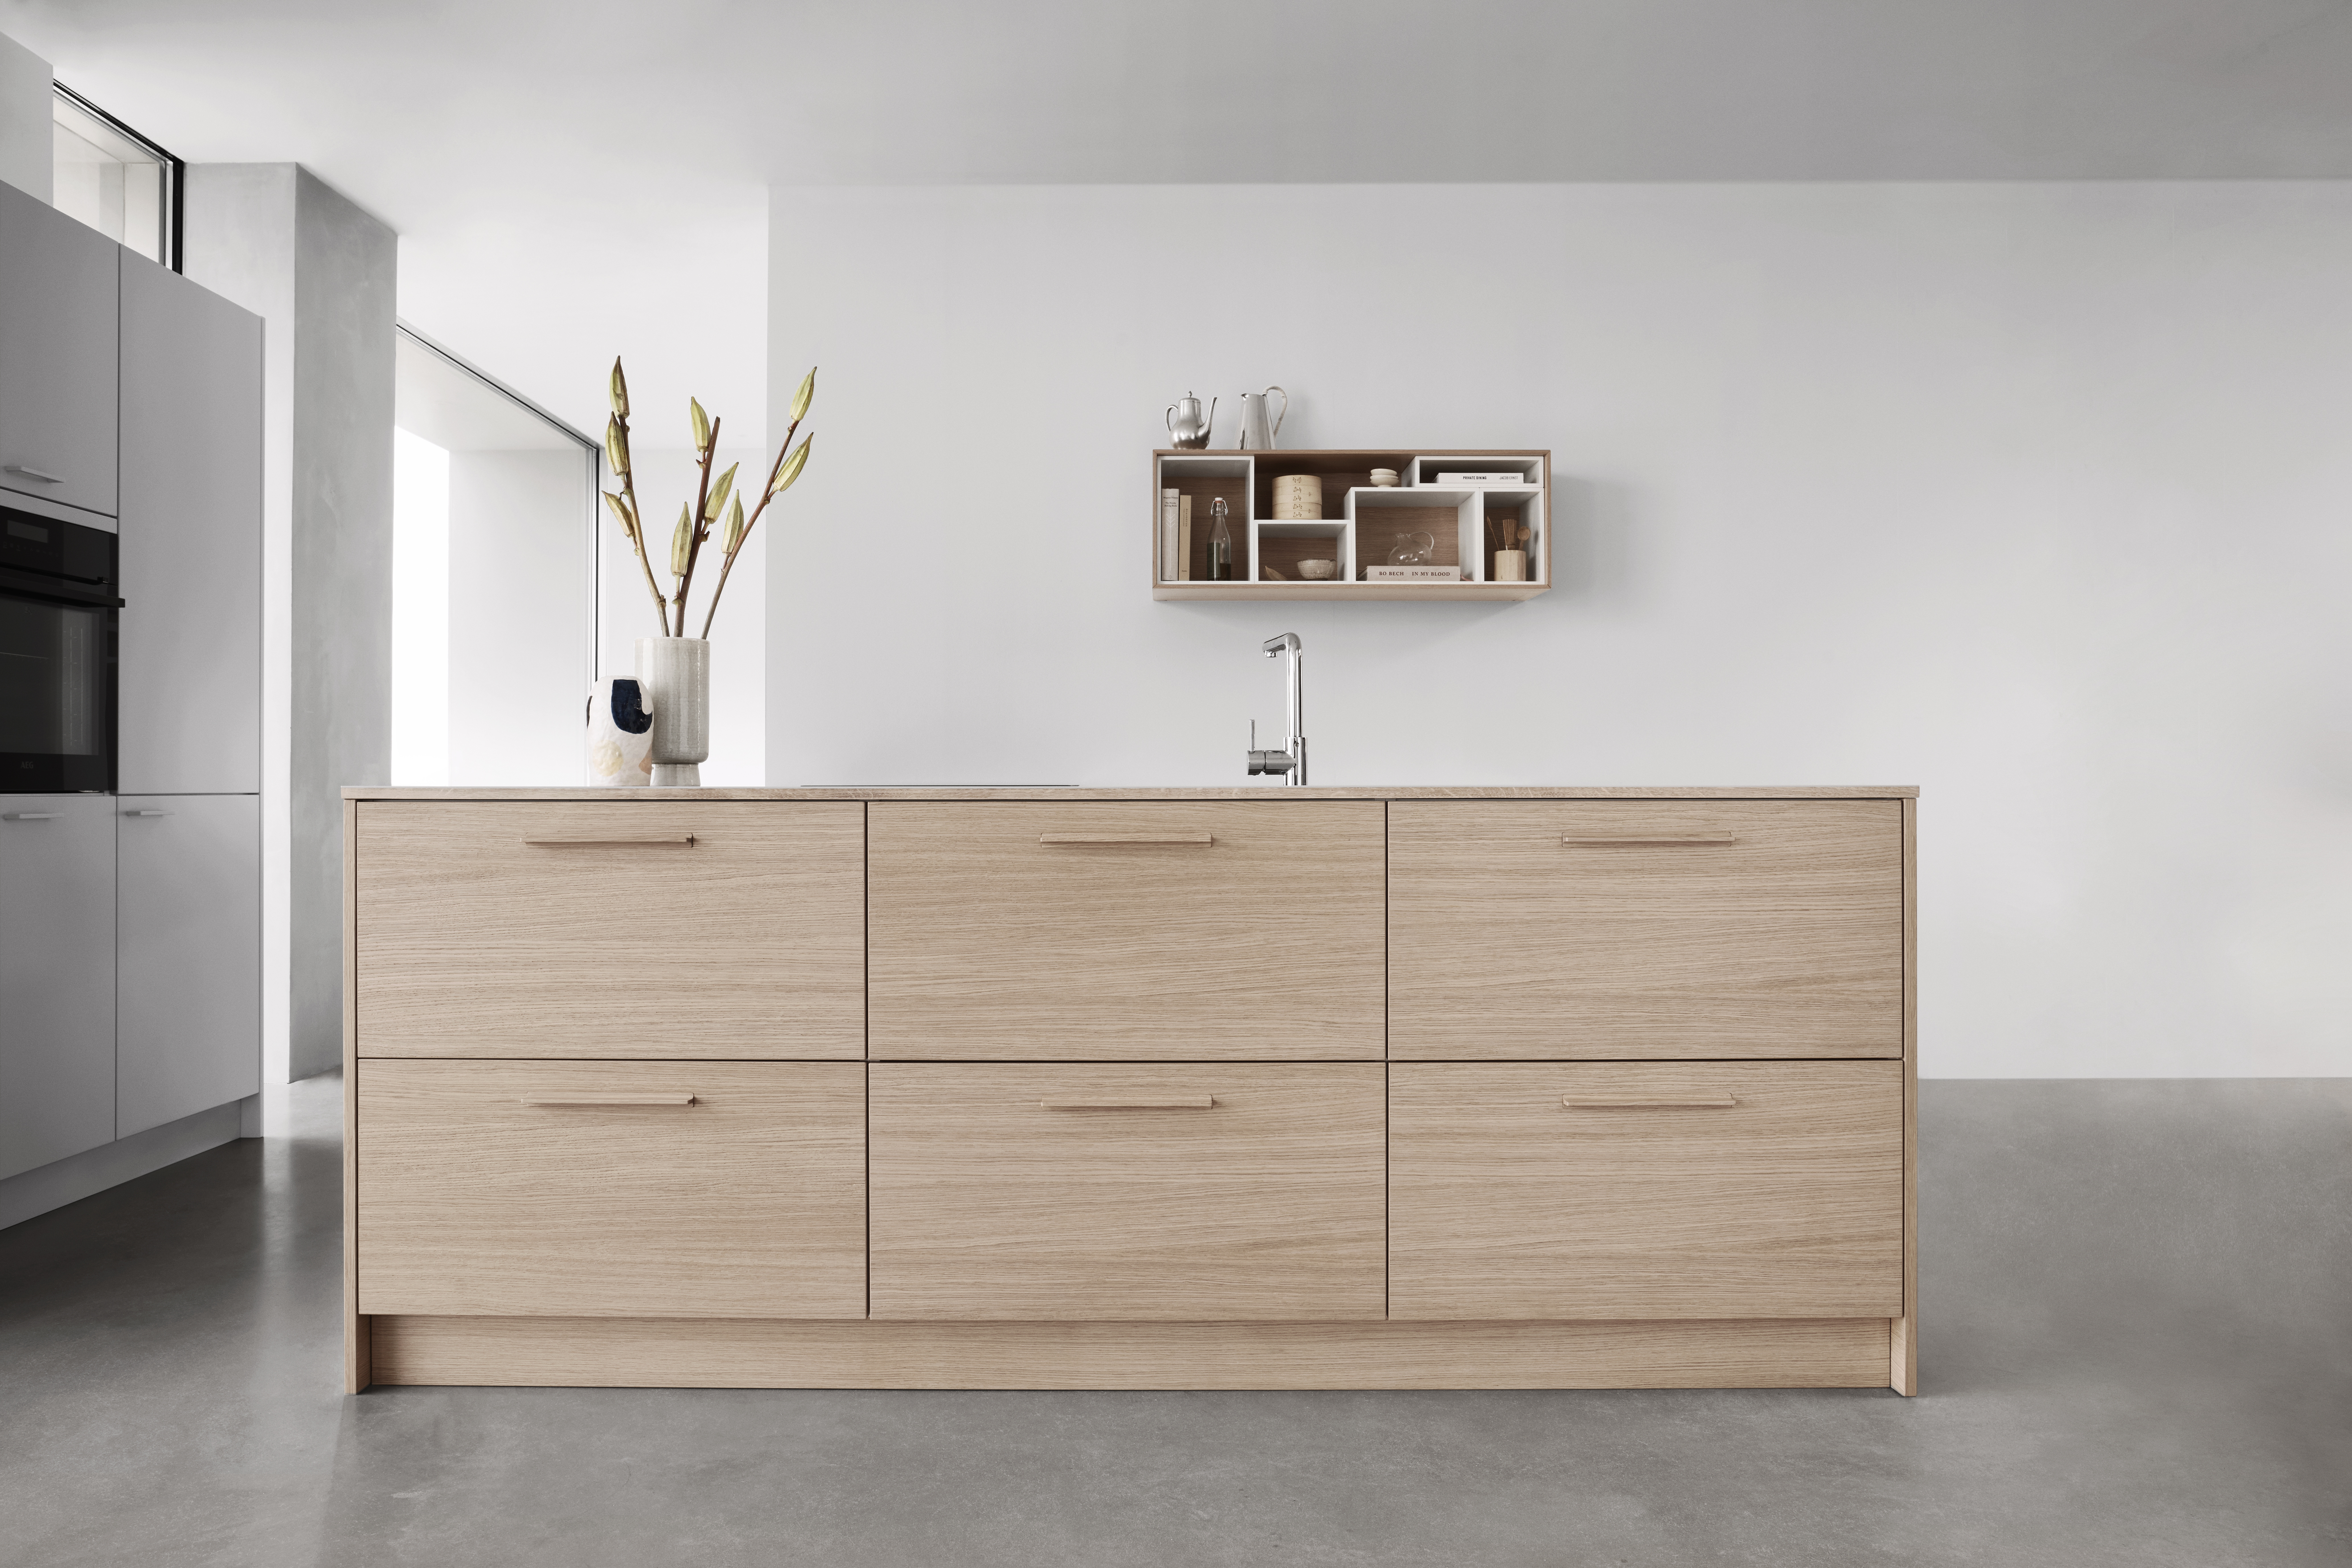 Picture of: Nyt Kokkendesign Fra Kvik